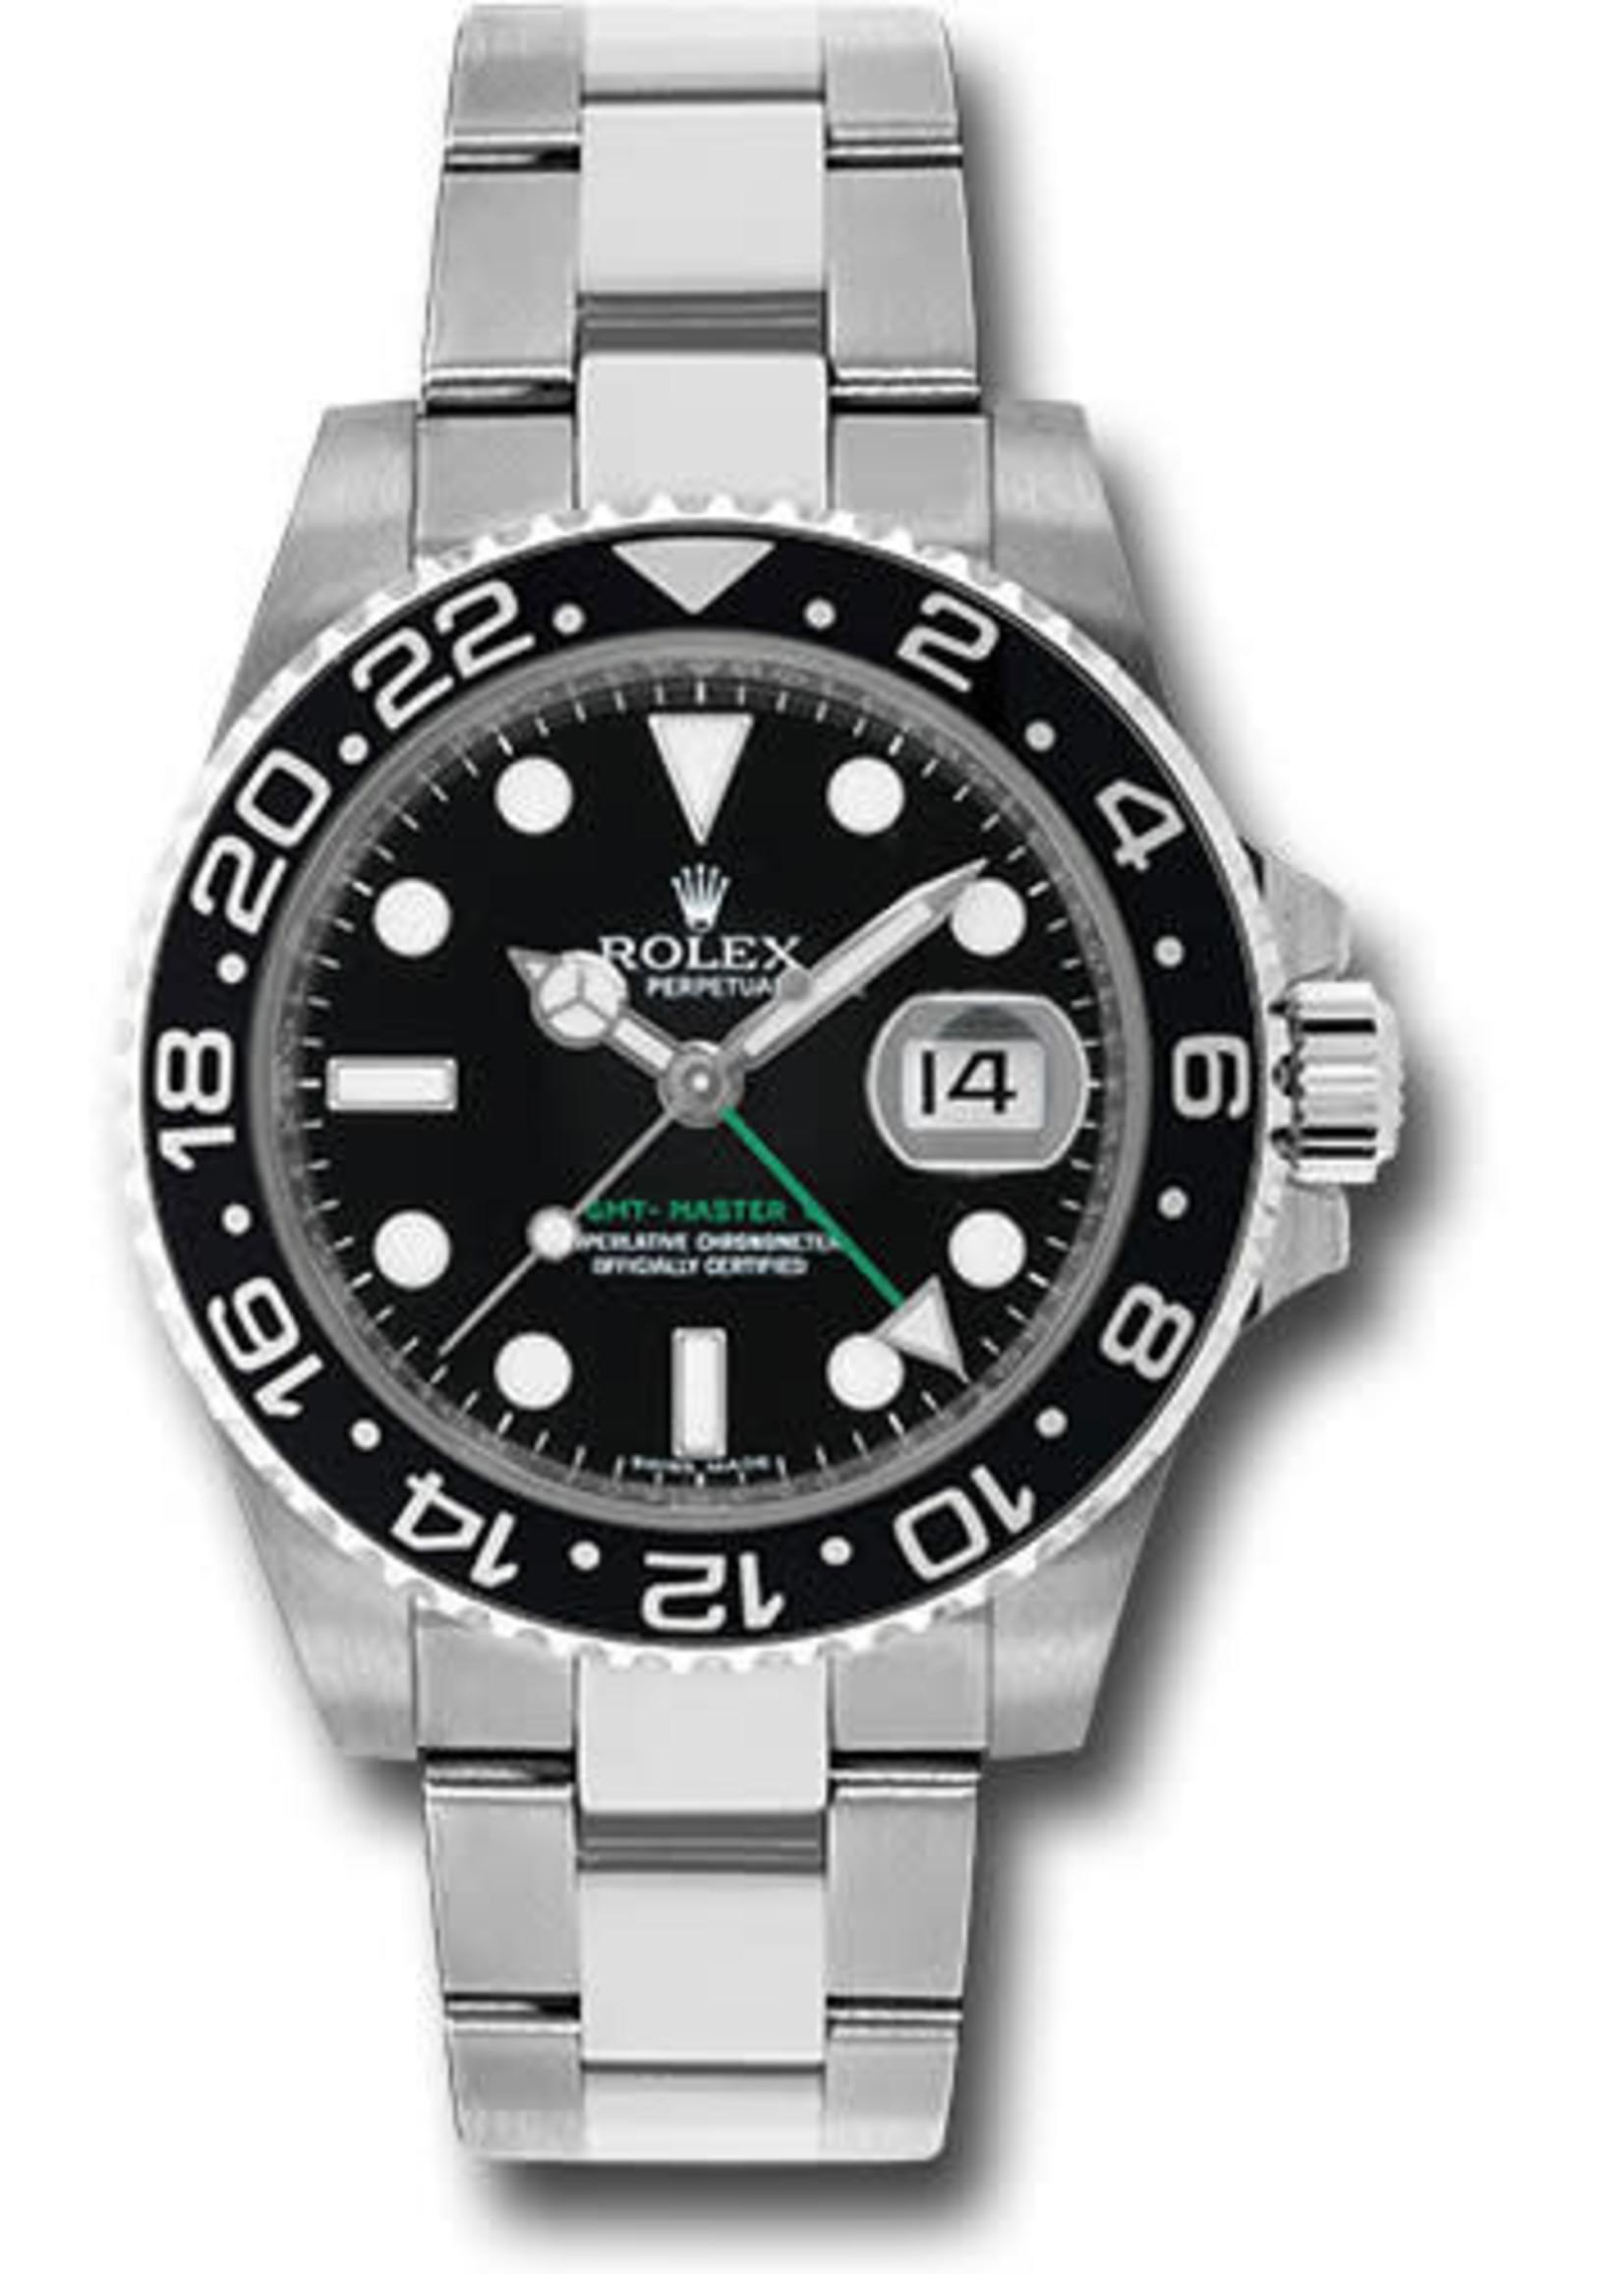 Rolex ROLEX GMT-MASTER II 40MM (2009) #116710LN